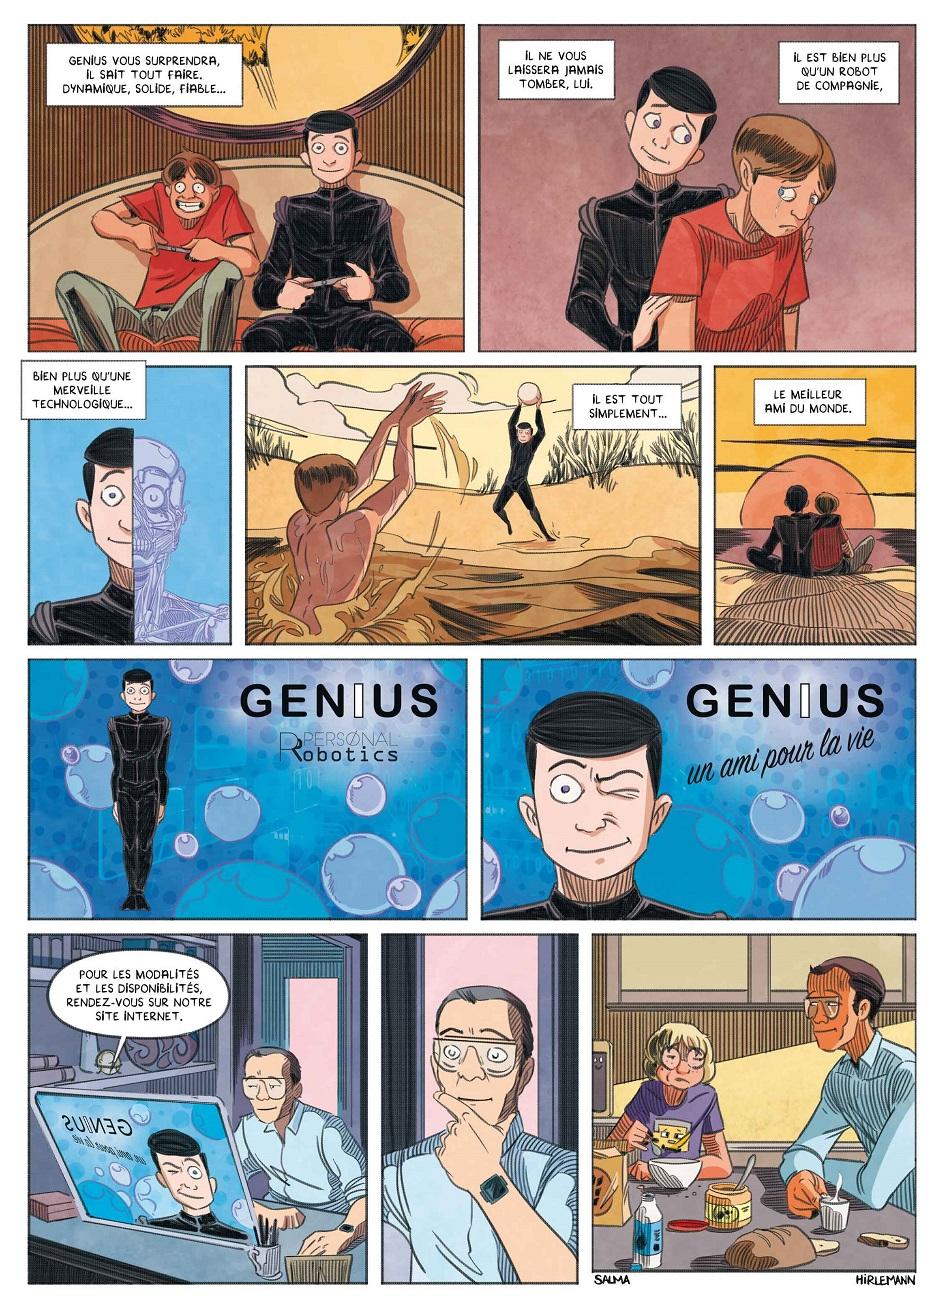 « Genius » page 5.